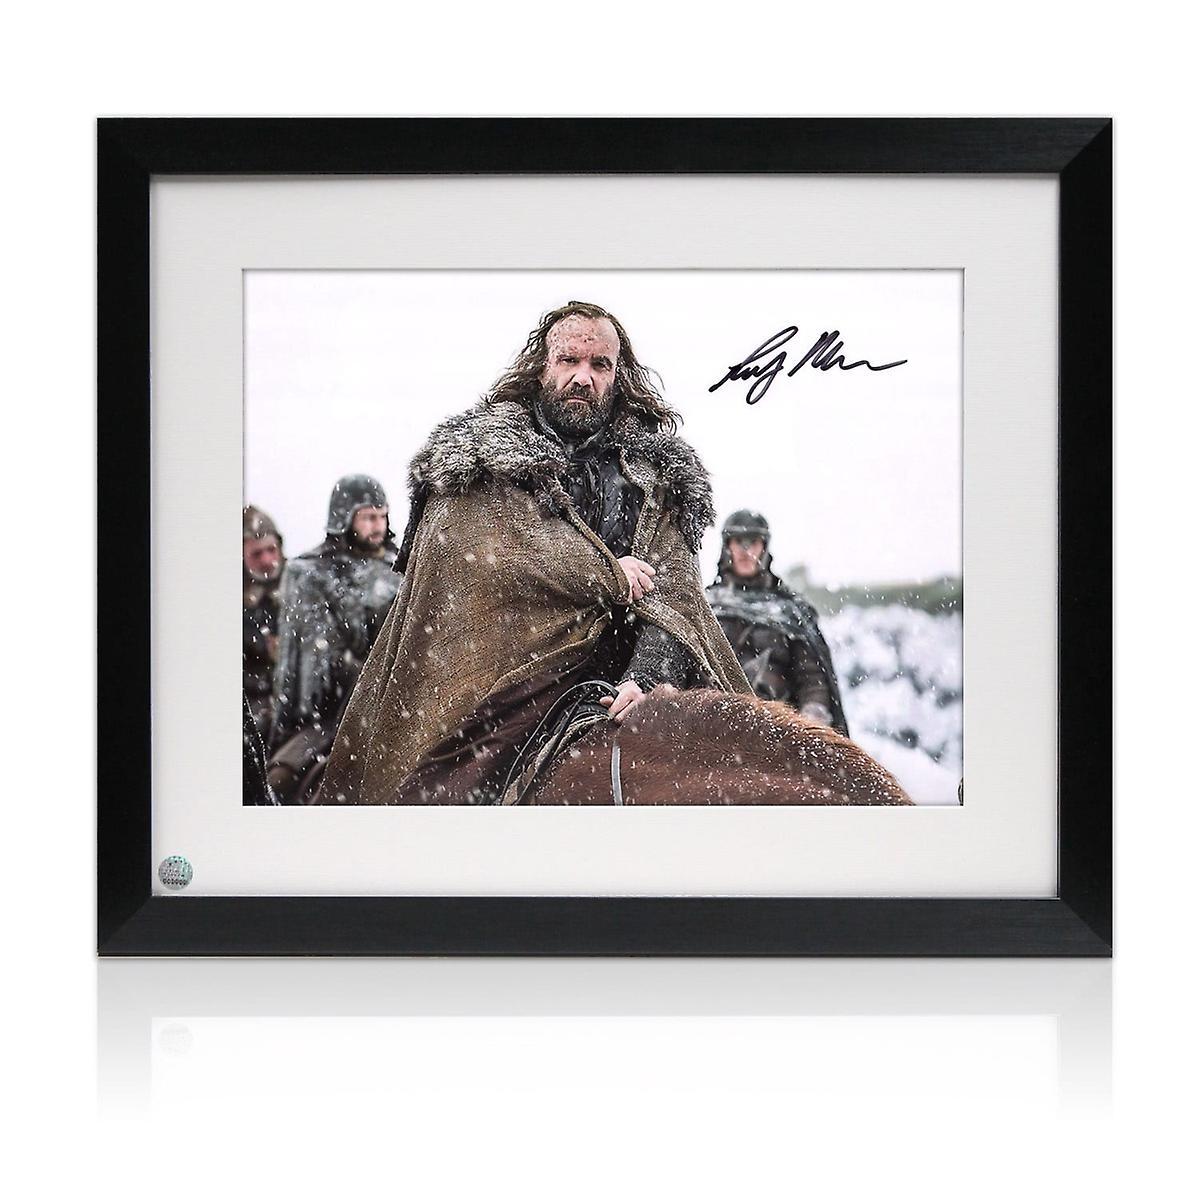 Sandor Clegane Signed Game Of Thrones Photo: The Hound Framed